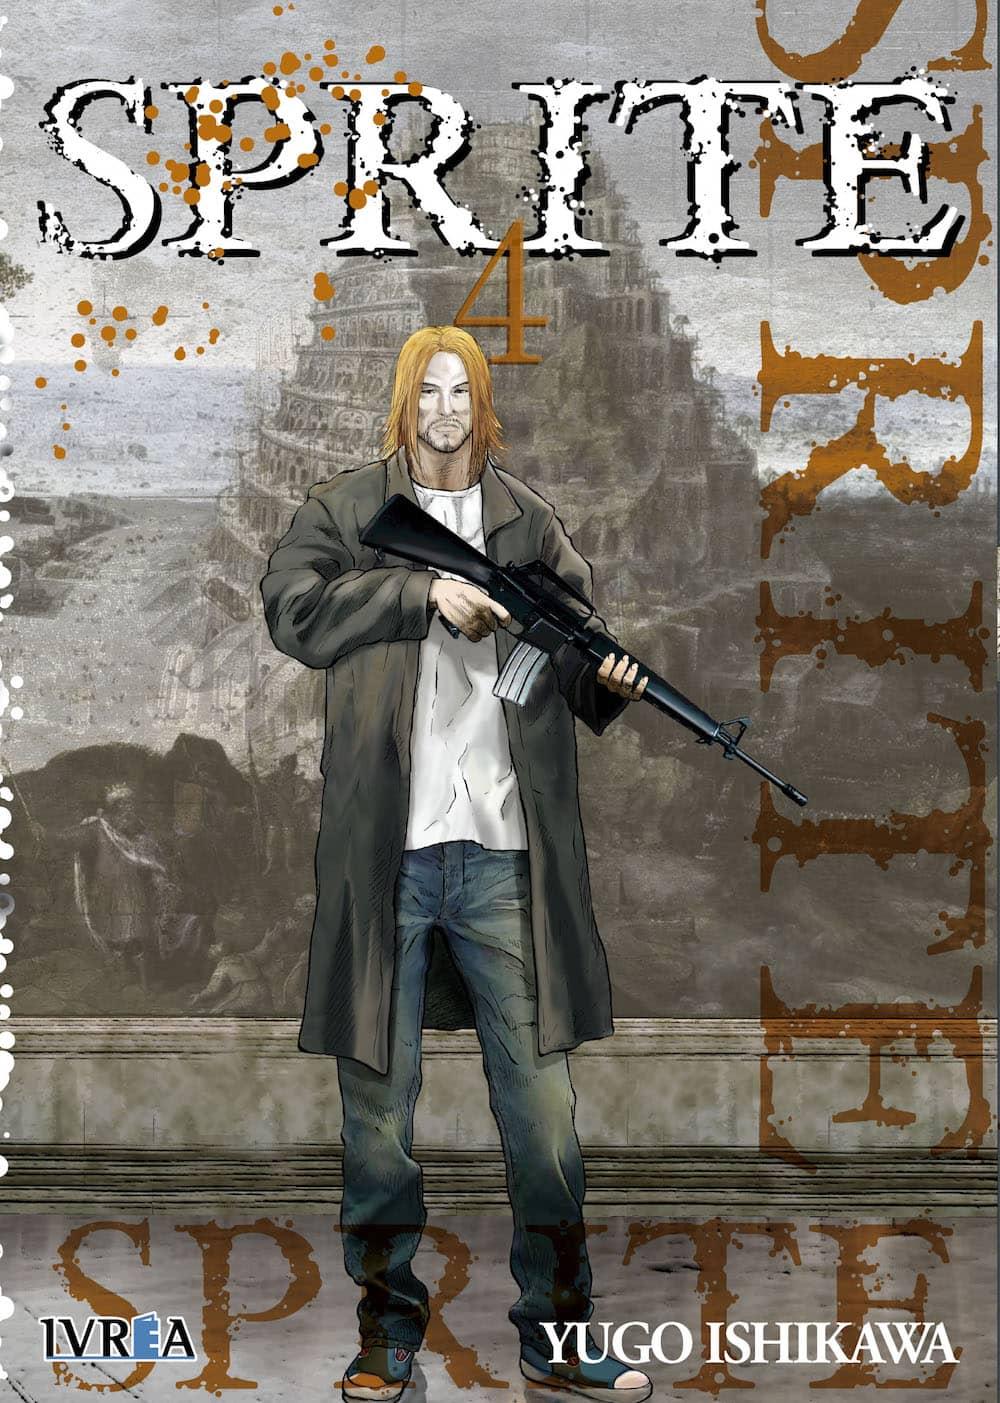 SPRITE 04 (COMIC)